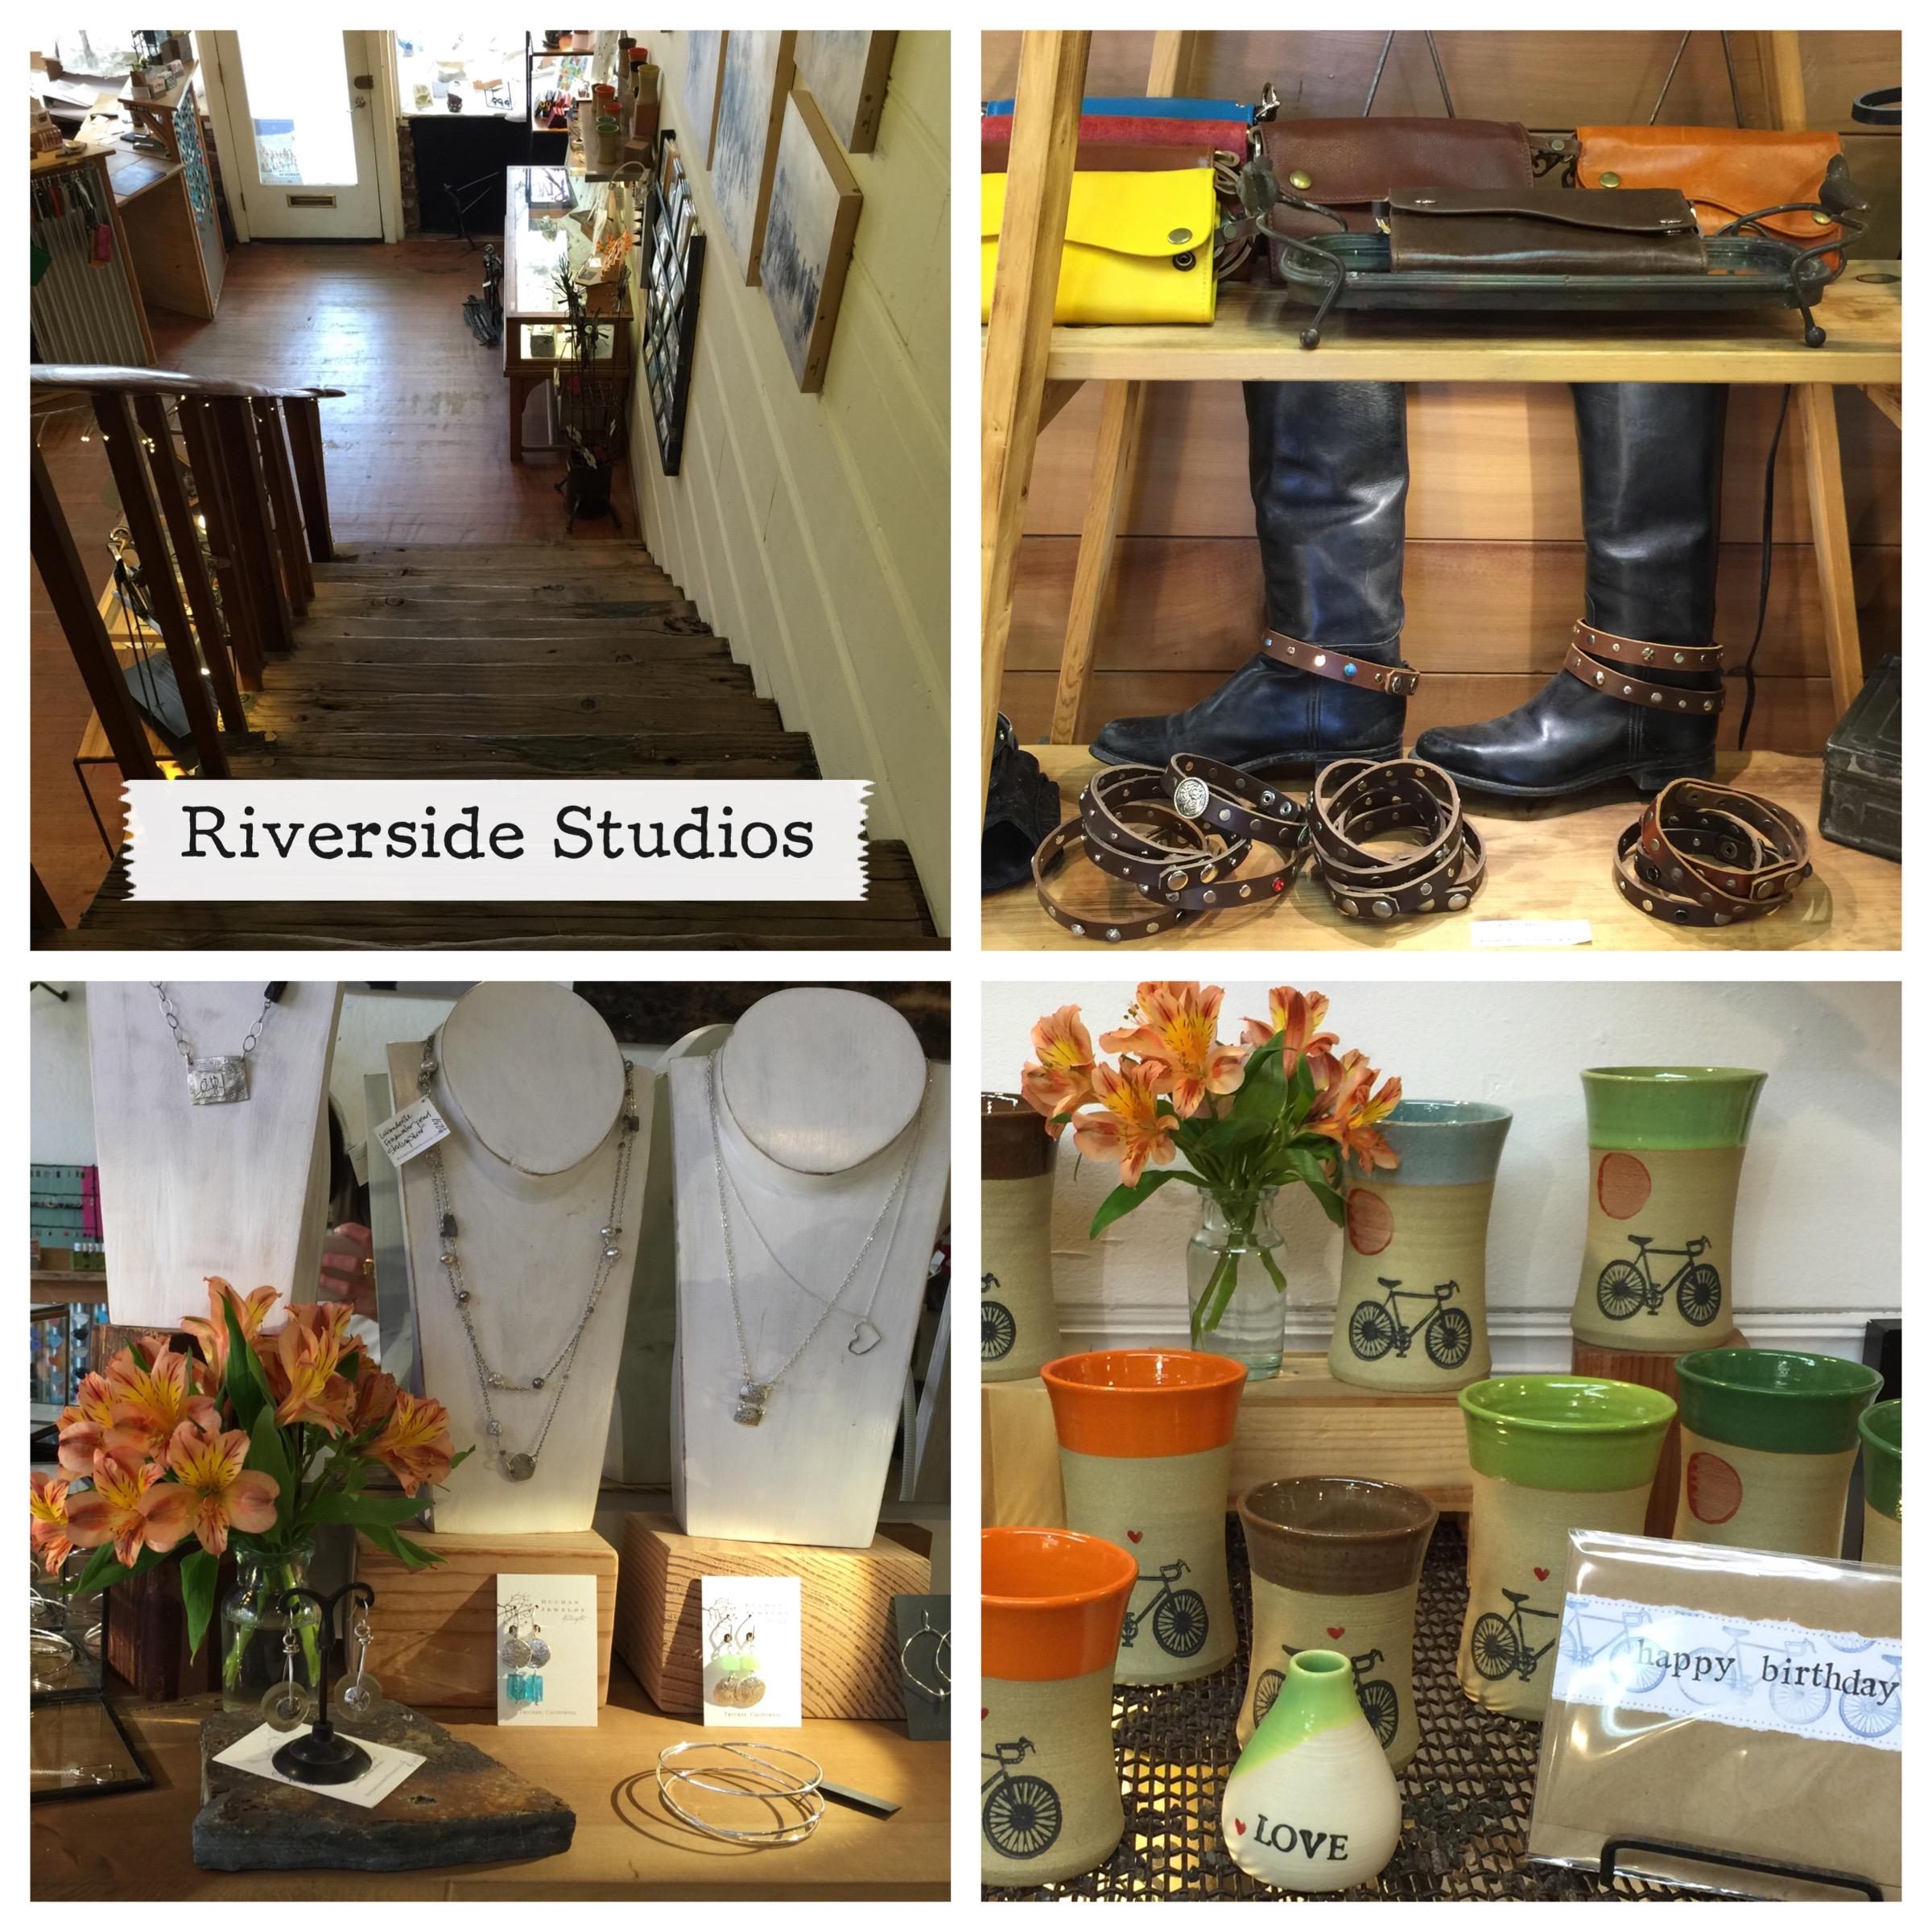 Riverside Studios